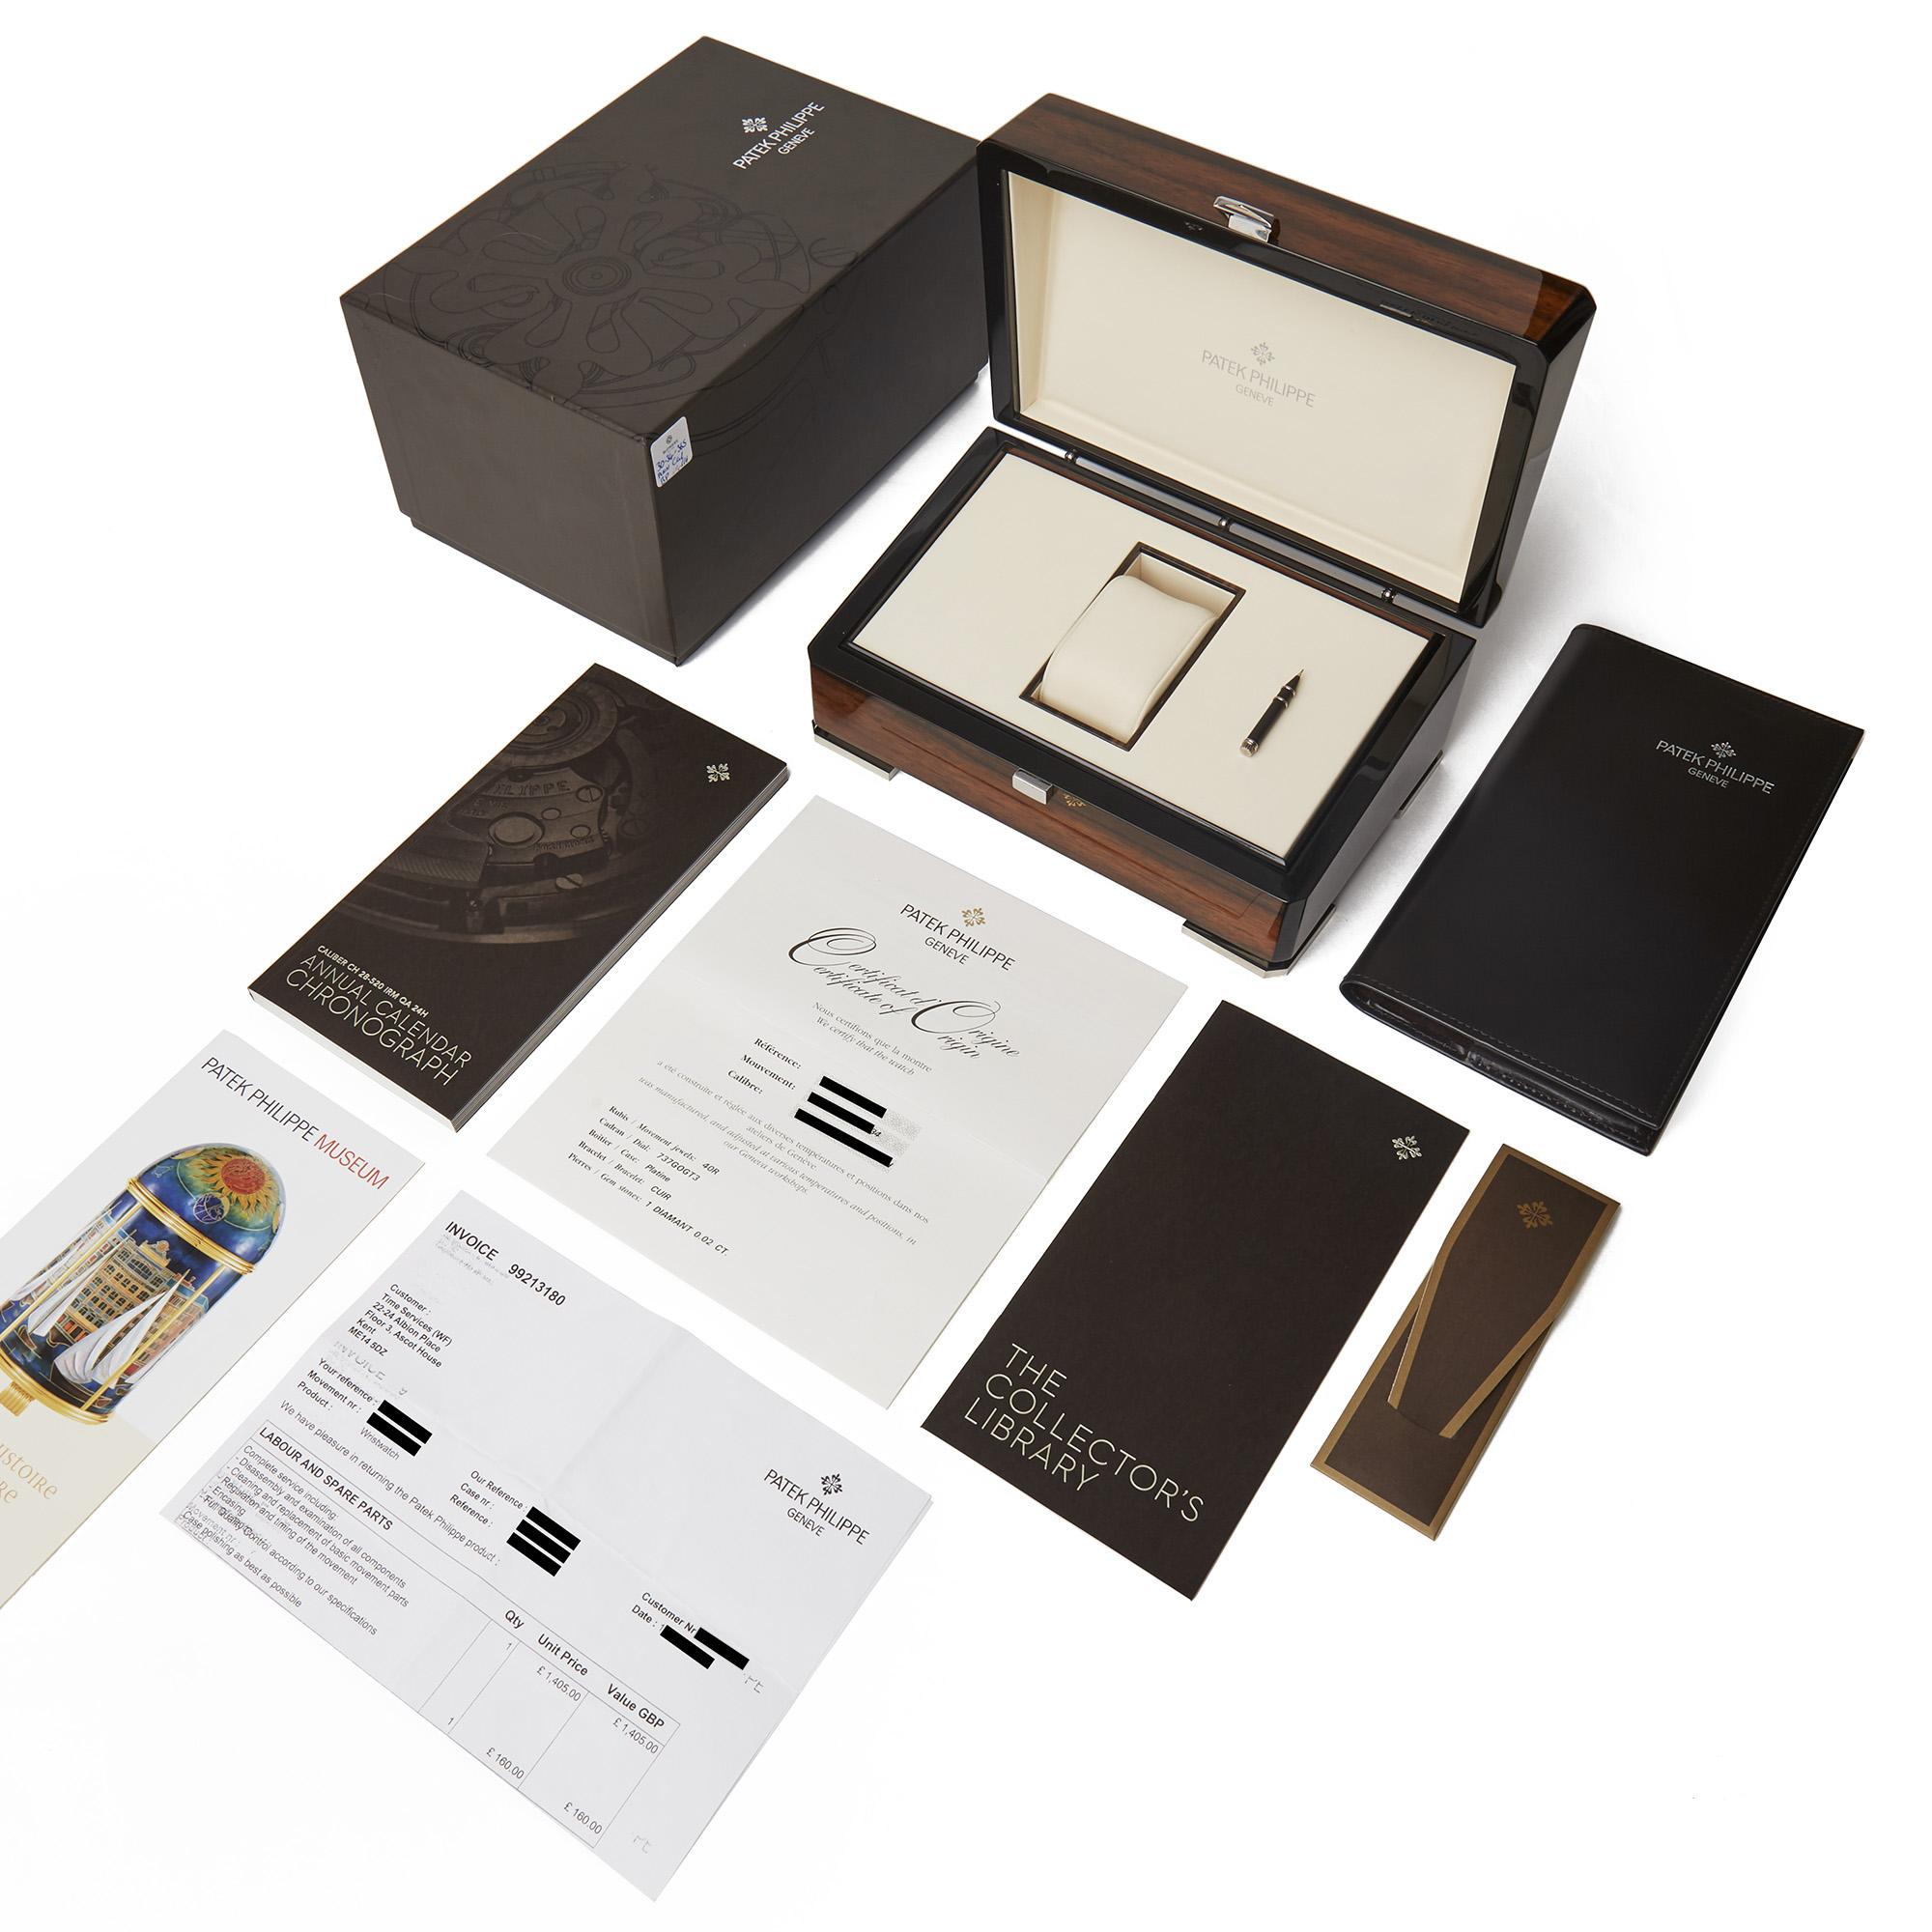 Patek Philippe Complication Annual Calendar Flyback Chronograph Platinum - 5960P-001 - Image 2 of 7